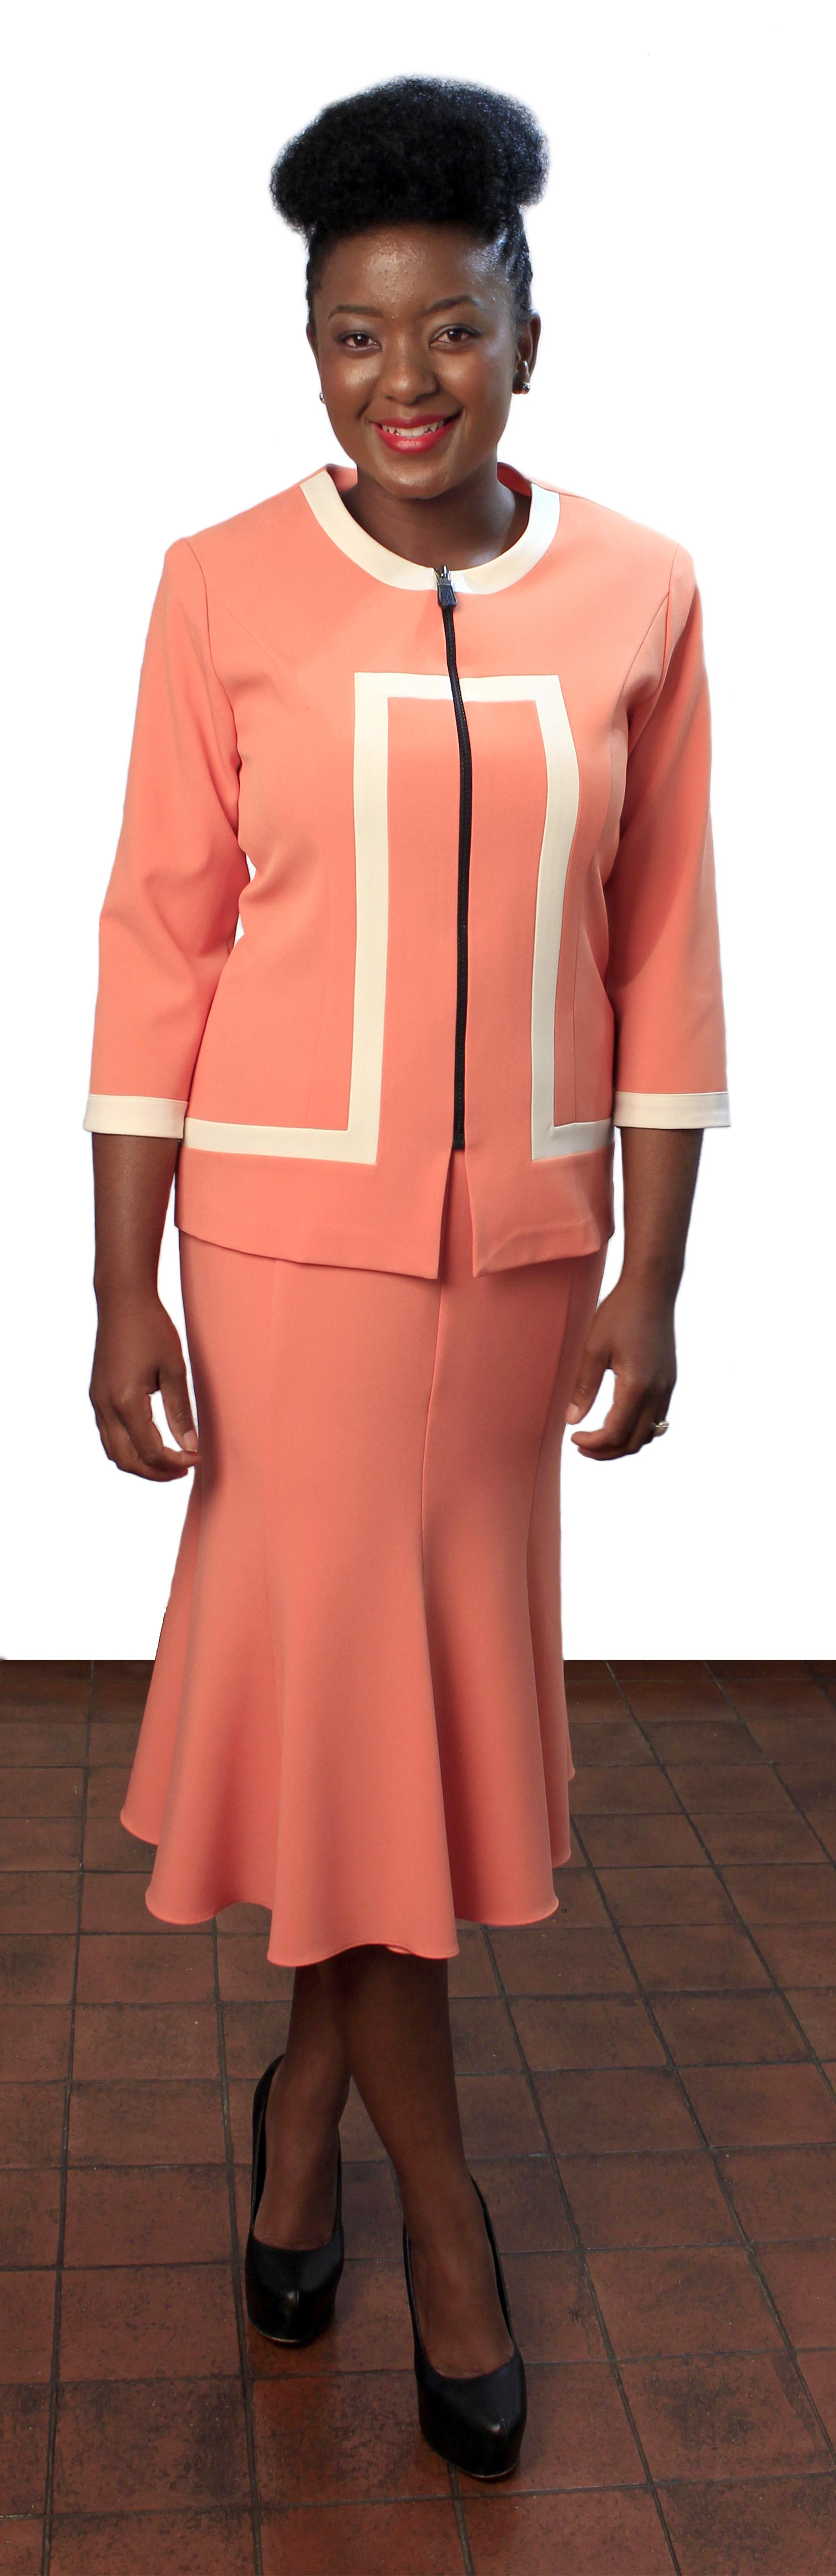 Pin by femina garments on boutique nd range pinterest